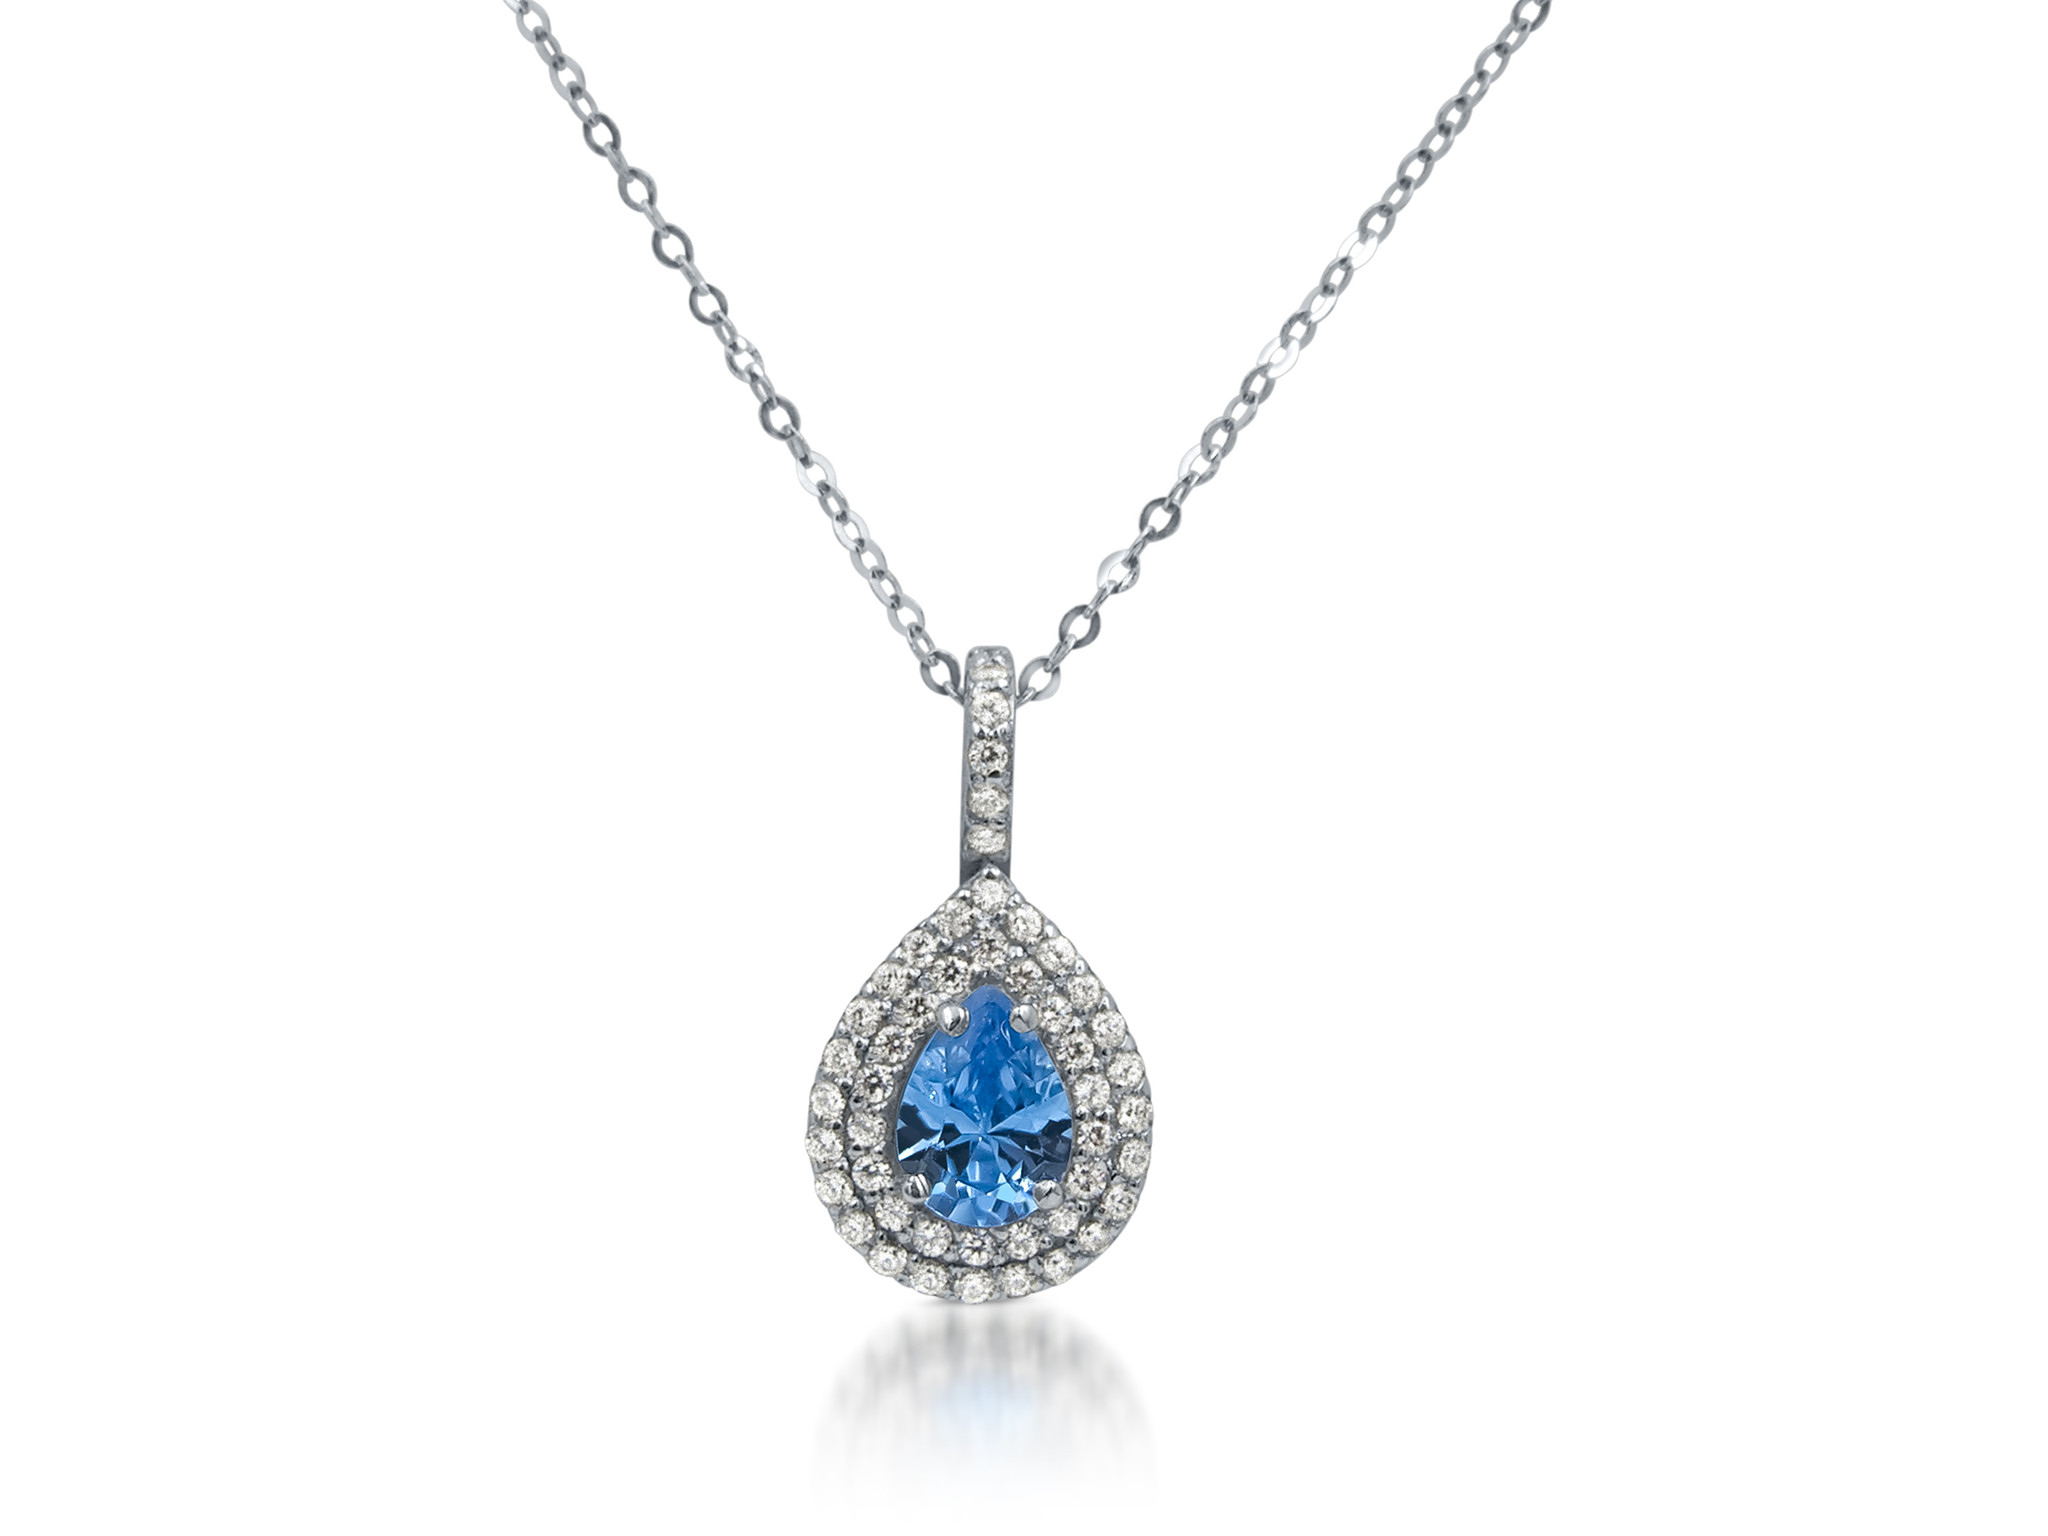 18 kt white gold pendant with blue & white zirconia